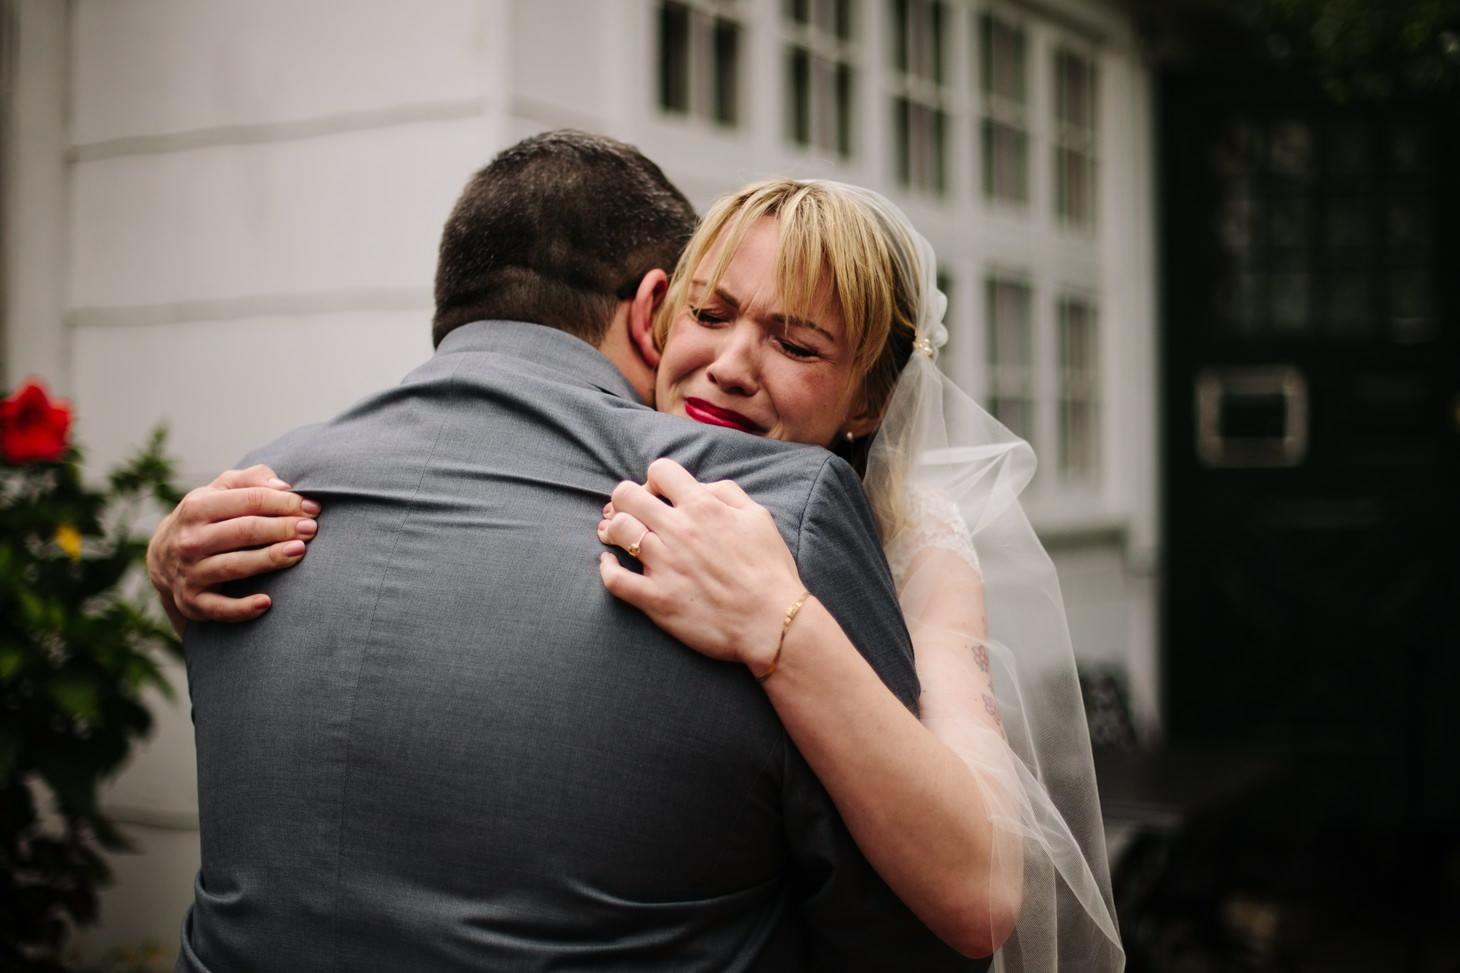 nyc-wedding-photographer-brooklyn-bridge-smitten-chickens-rainy-emotional-wedding-003.jpg